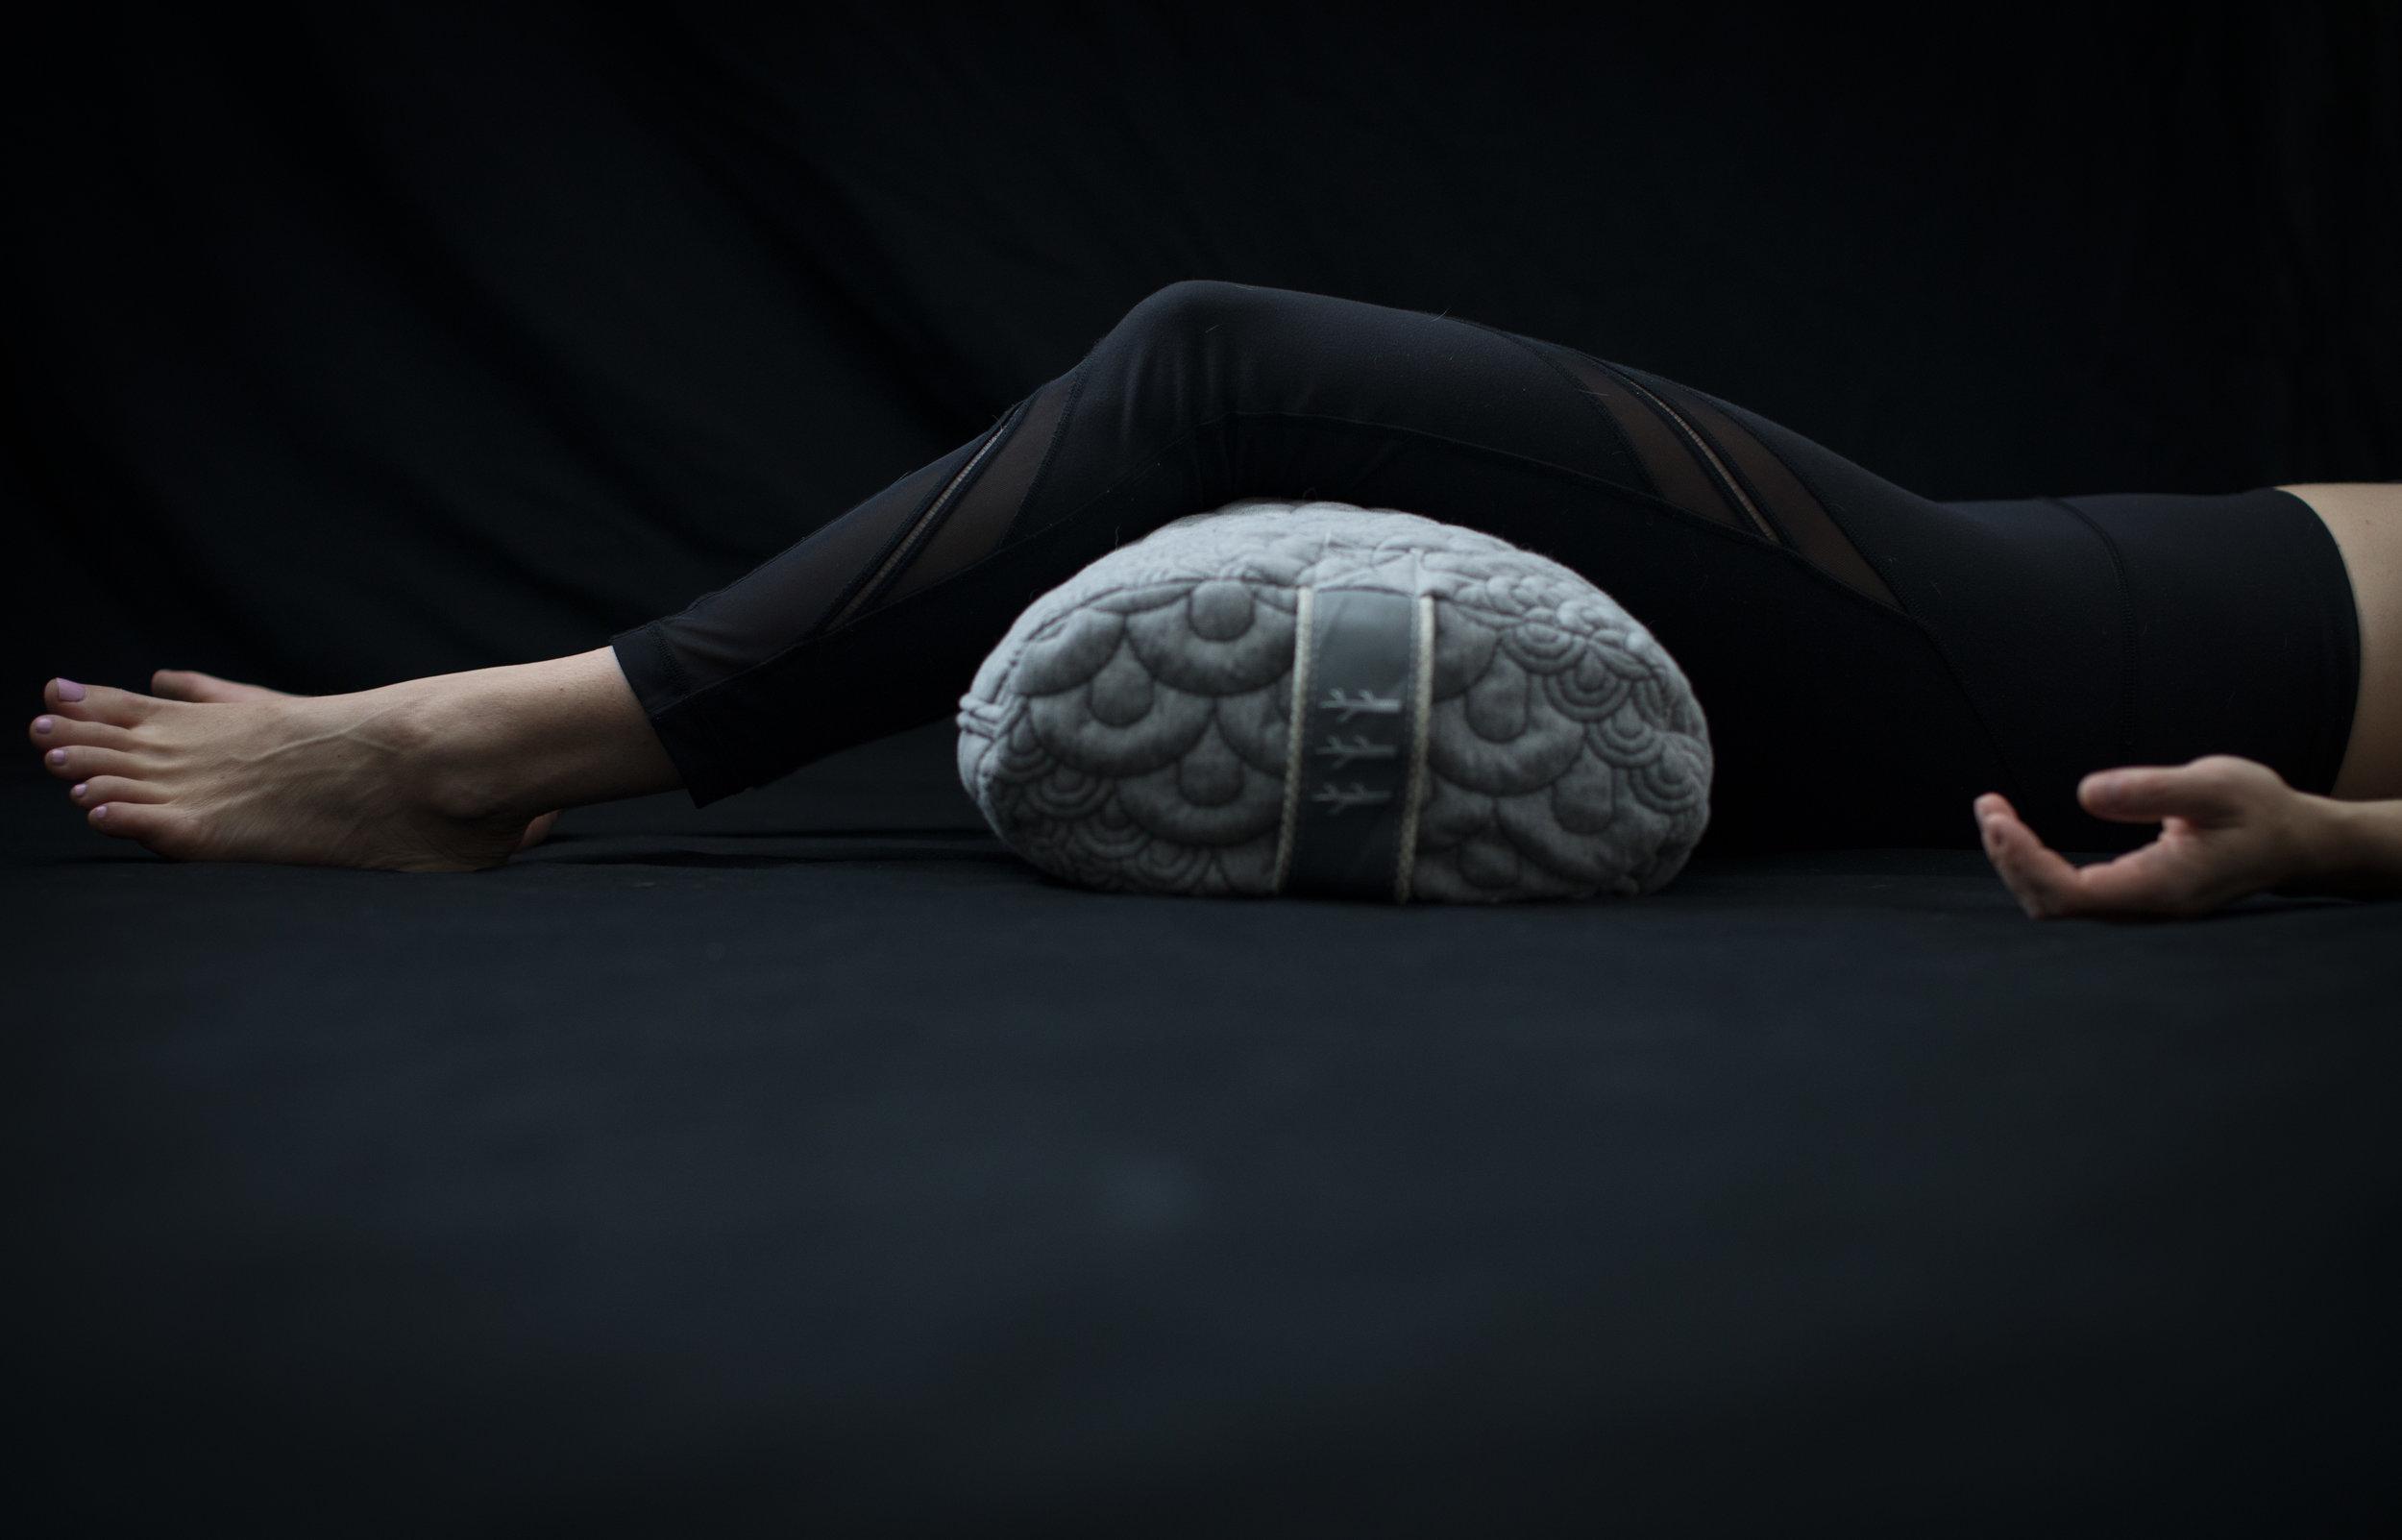 online yoga nidra teacher training - LEARN to lead empowering, healing Yoga Nidra guided meditation EXPERIENCES